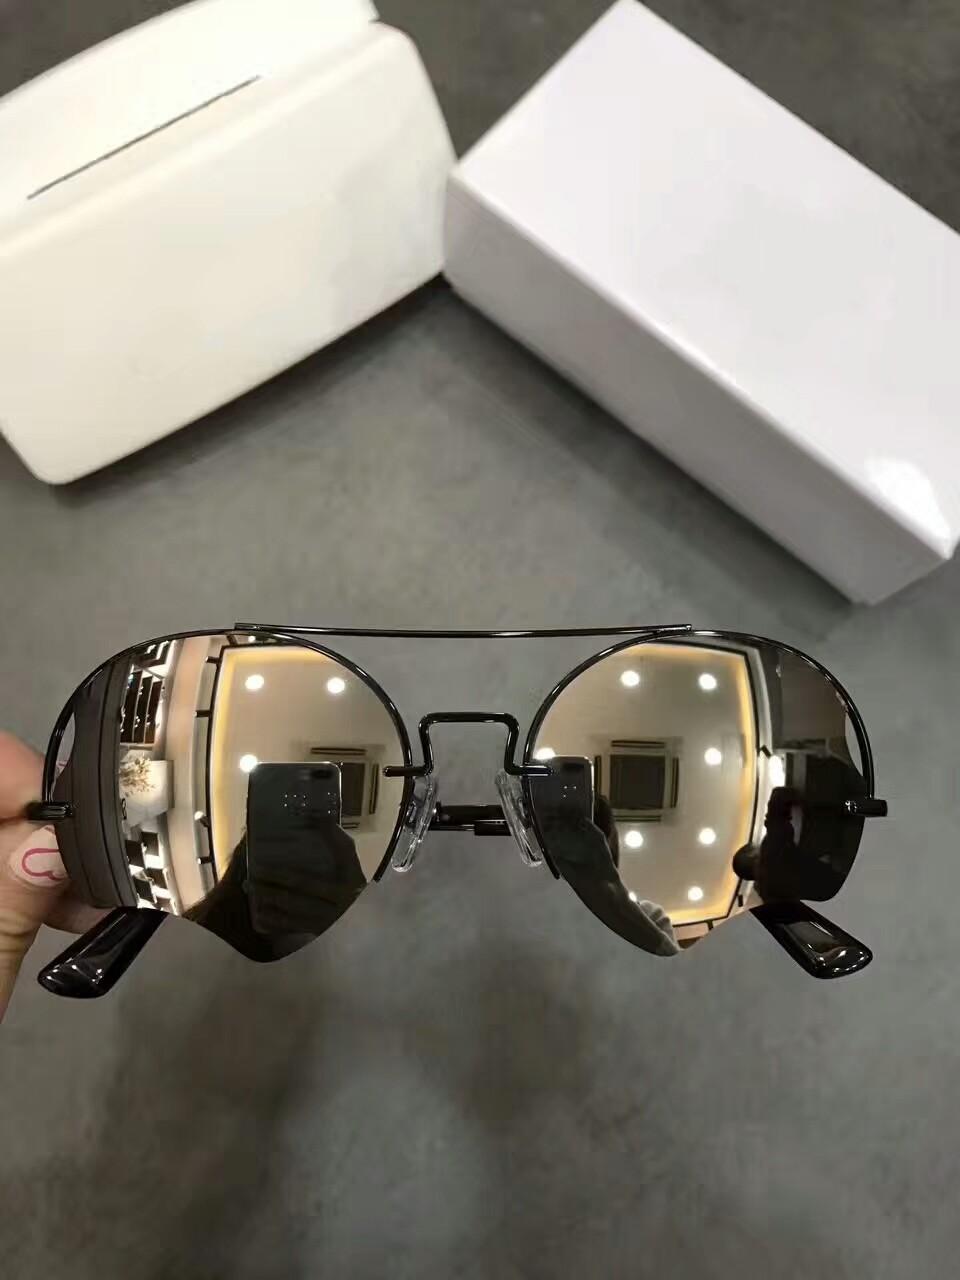 designer sunglasses for men KE men sunglasses for women womens sun glasses men brand designer coating UV protection fashion sunglasses